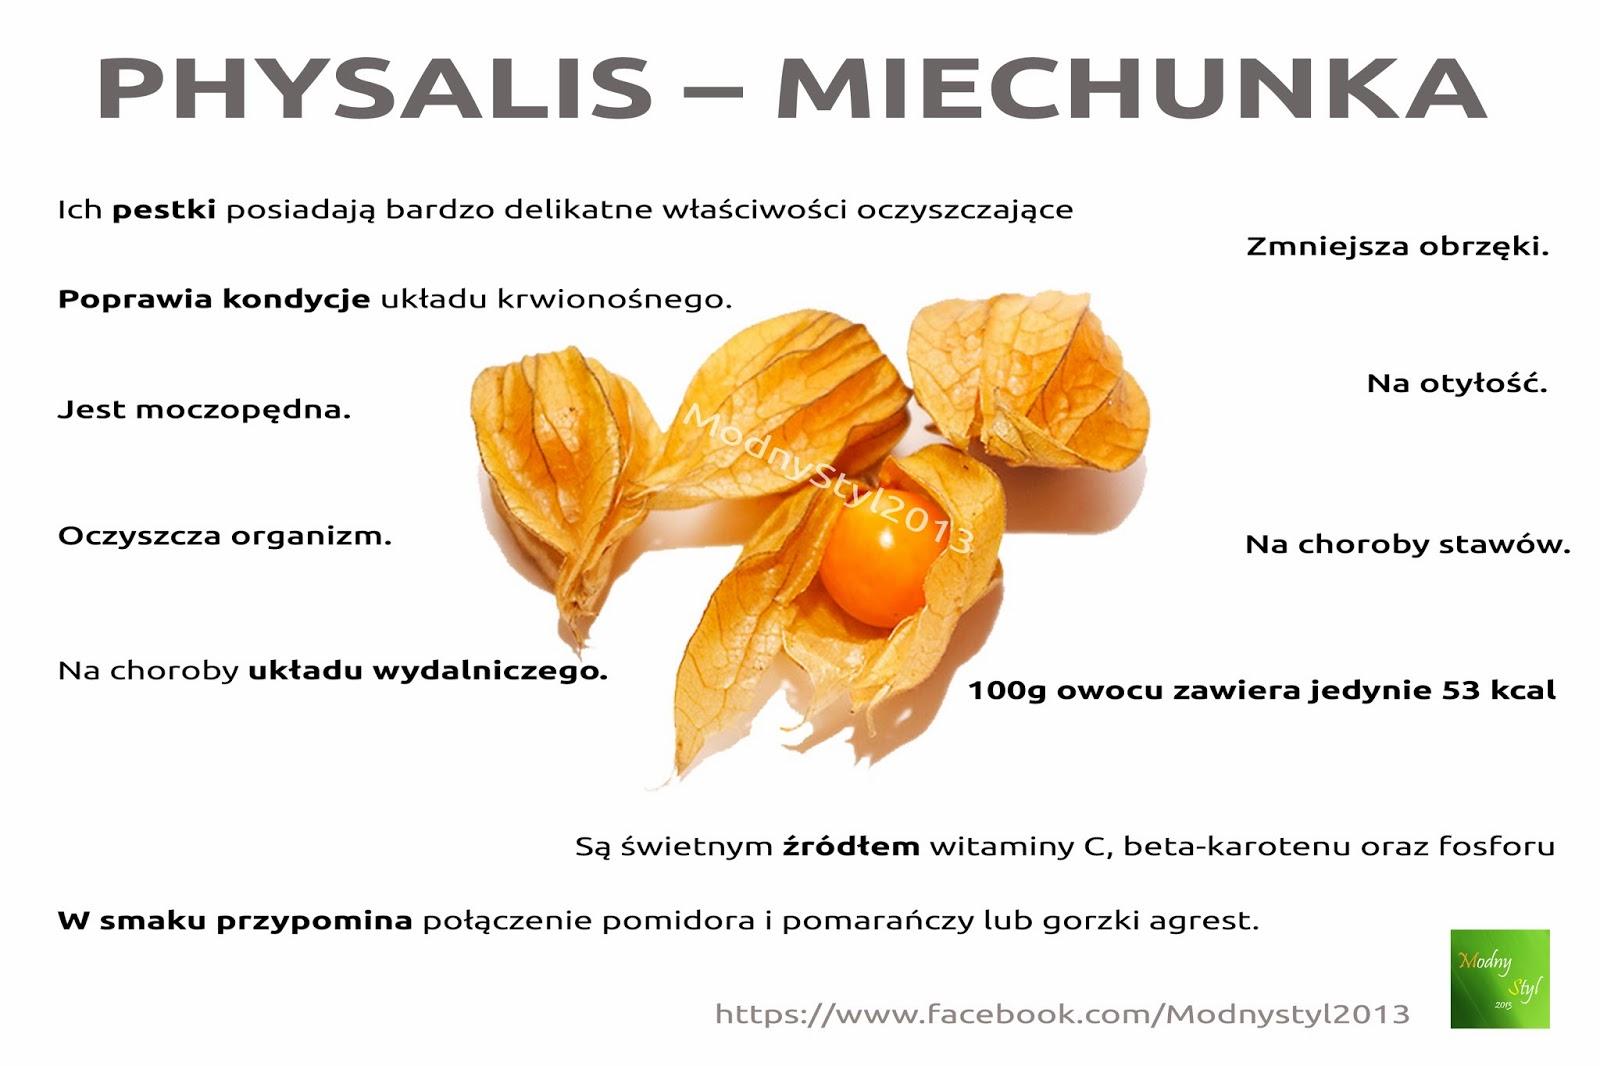 Physalis - miechunka